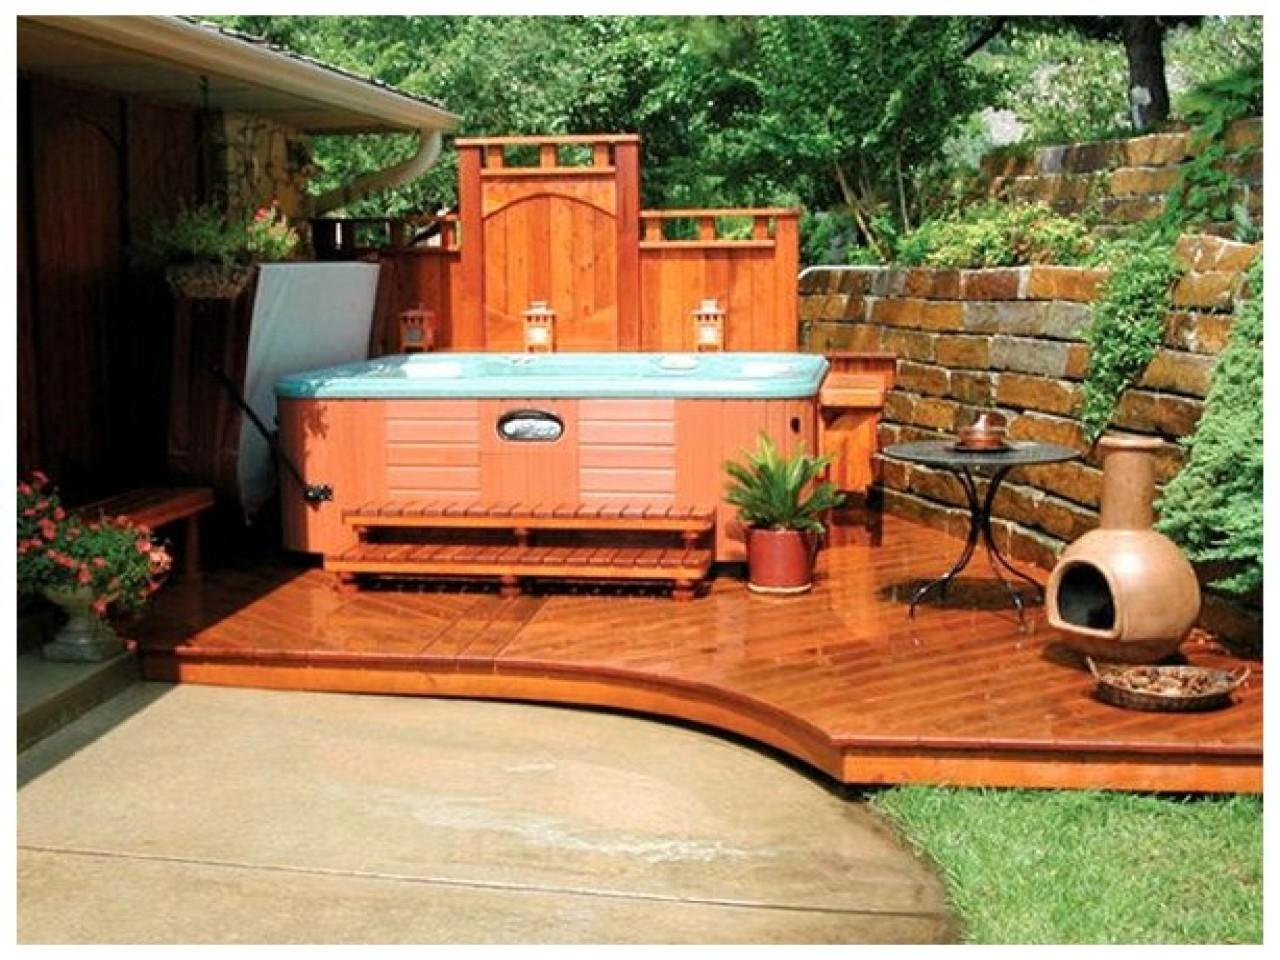 Home Design Ideas Cool Backyard Hot Tub Designs ...